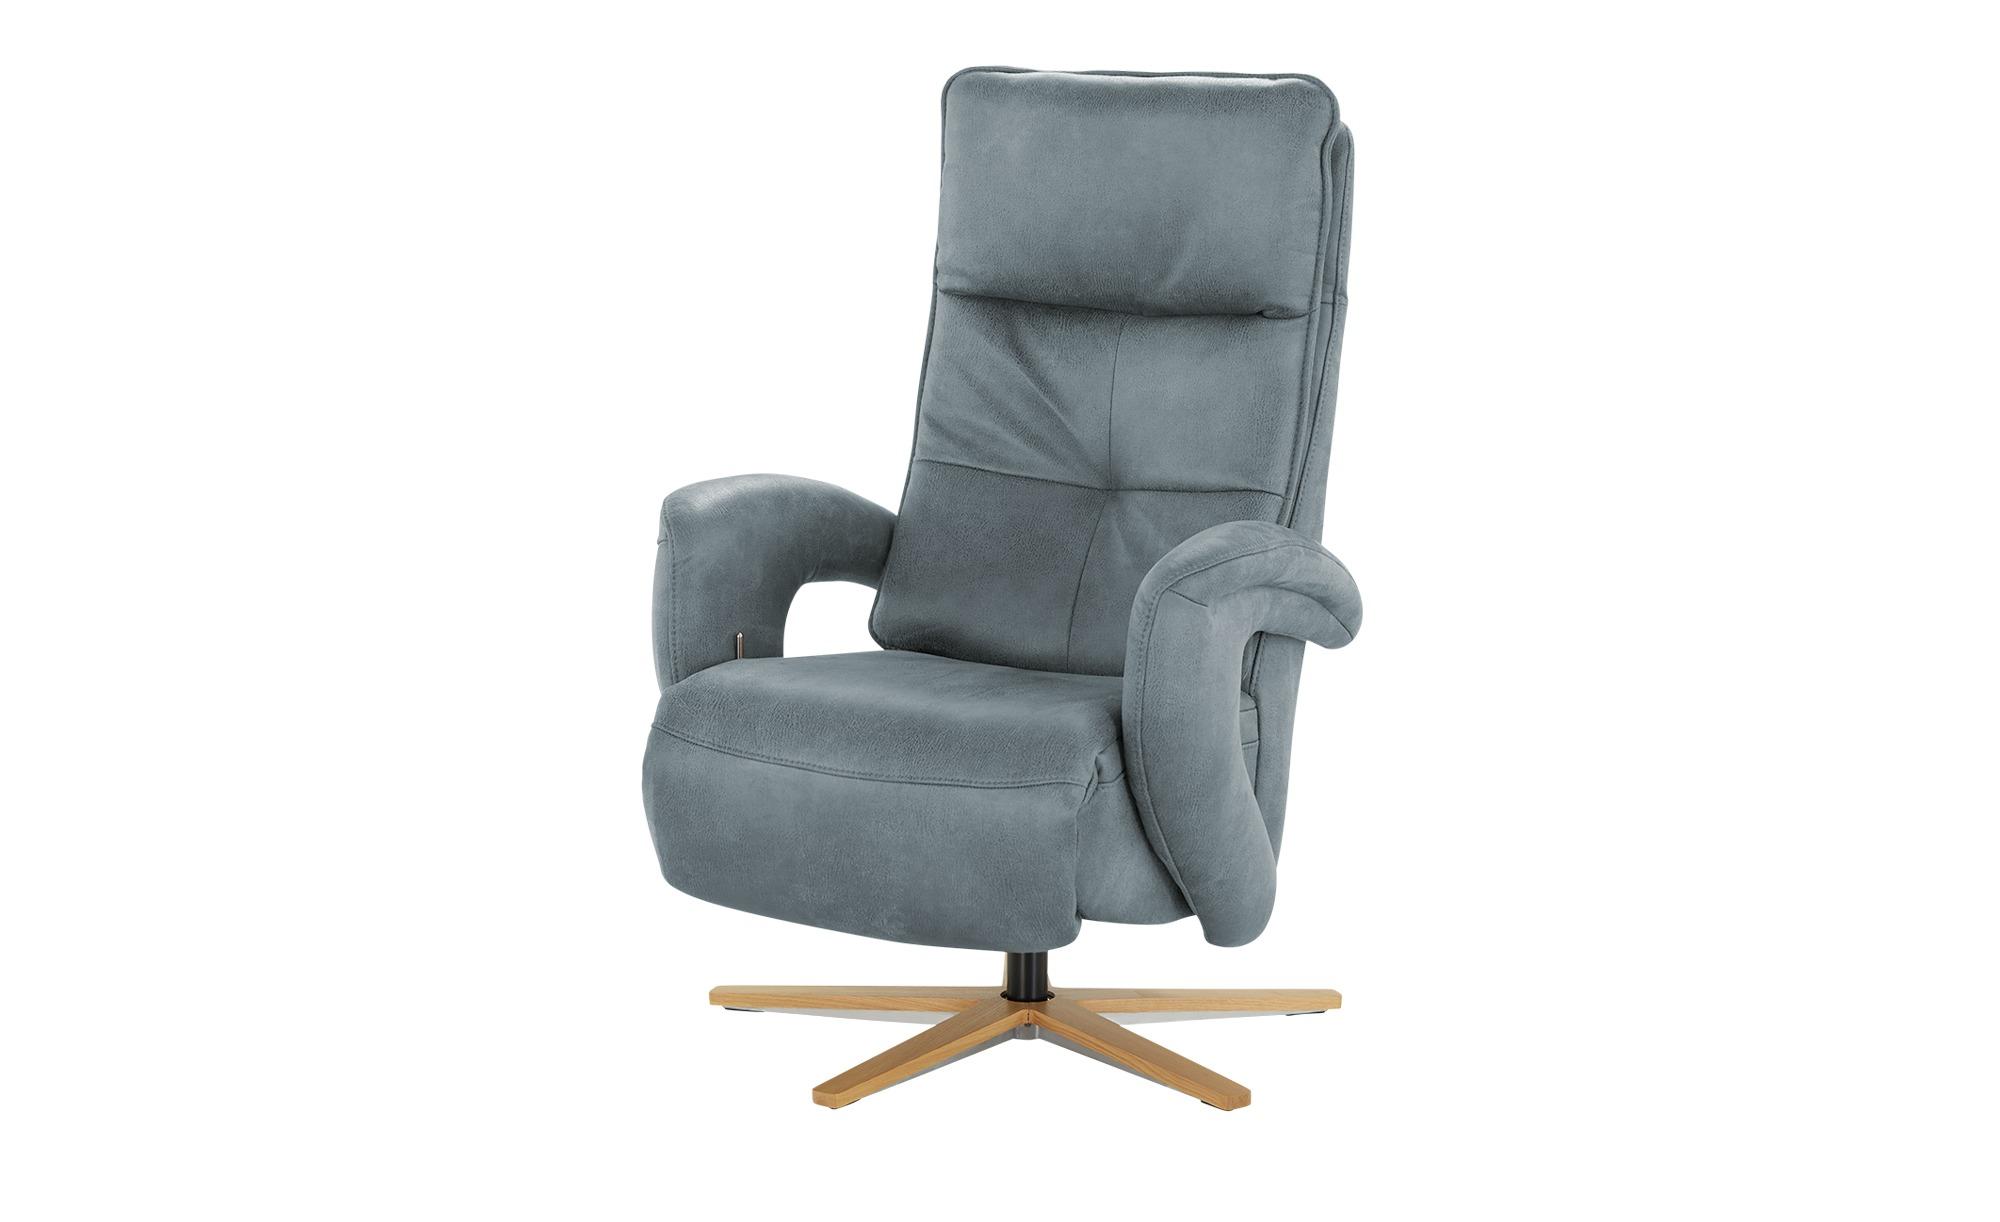 Relaxsessel  Edvin ¦ blau ¦ Maße (cm): B: 75 H: 112 T: 87 Polstermöbel > Sessel > Ledersessel - Höffner